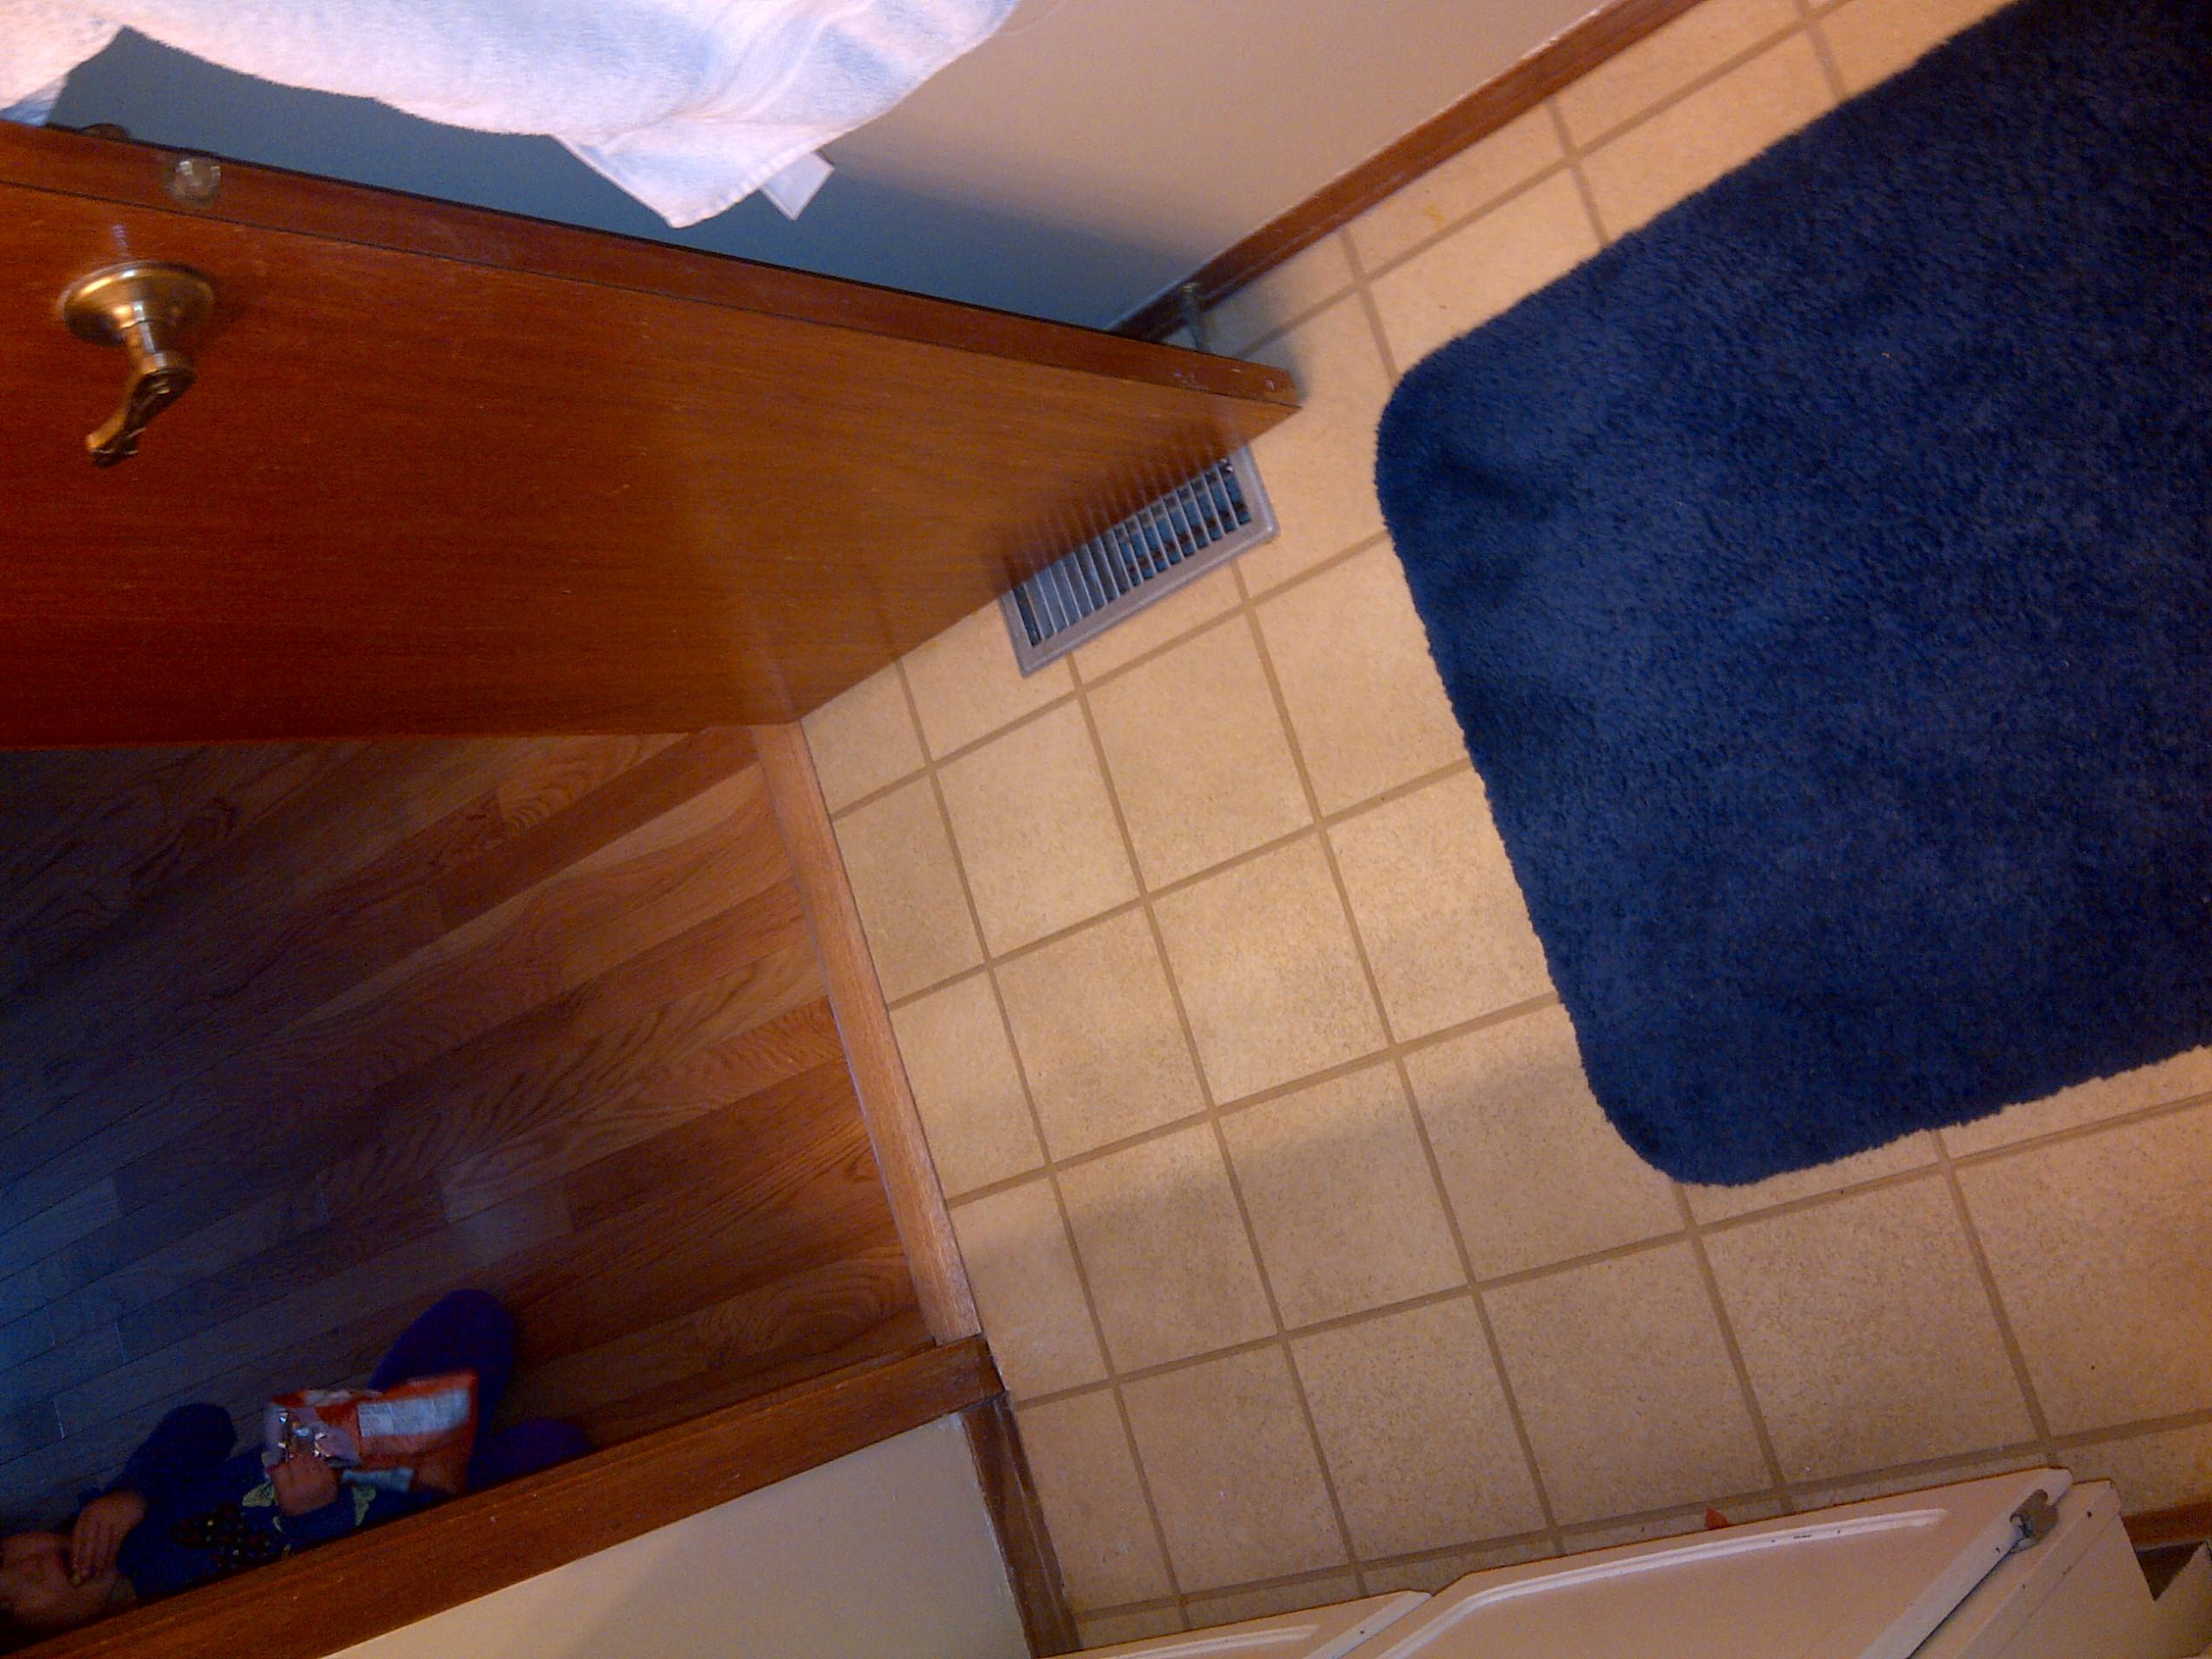 Bathroom Reno Construction Phase 1 (7).jpg